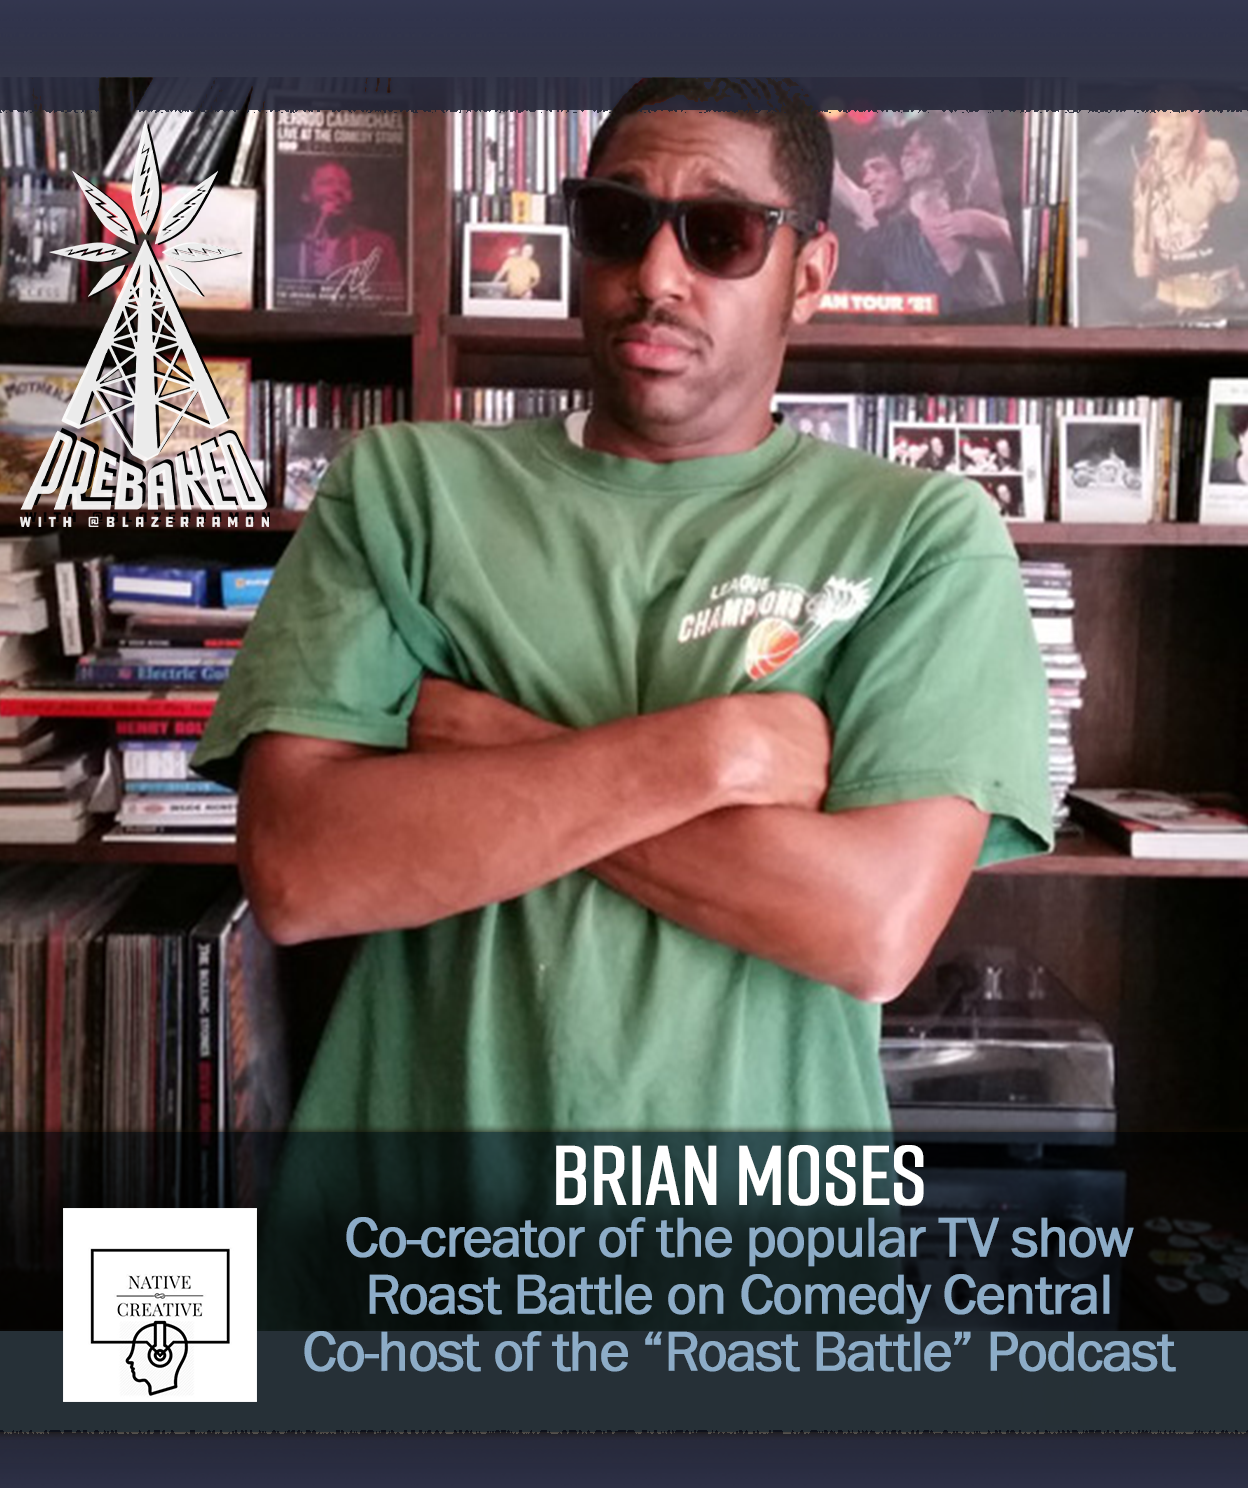 Prebaked-Ep5-Brian-Moses.png